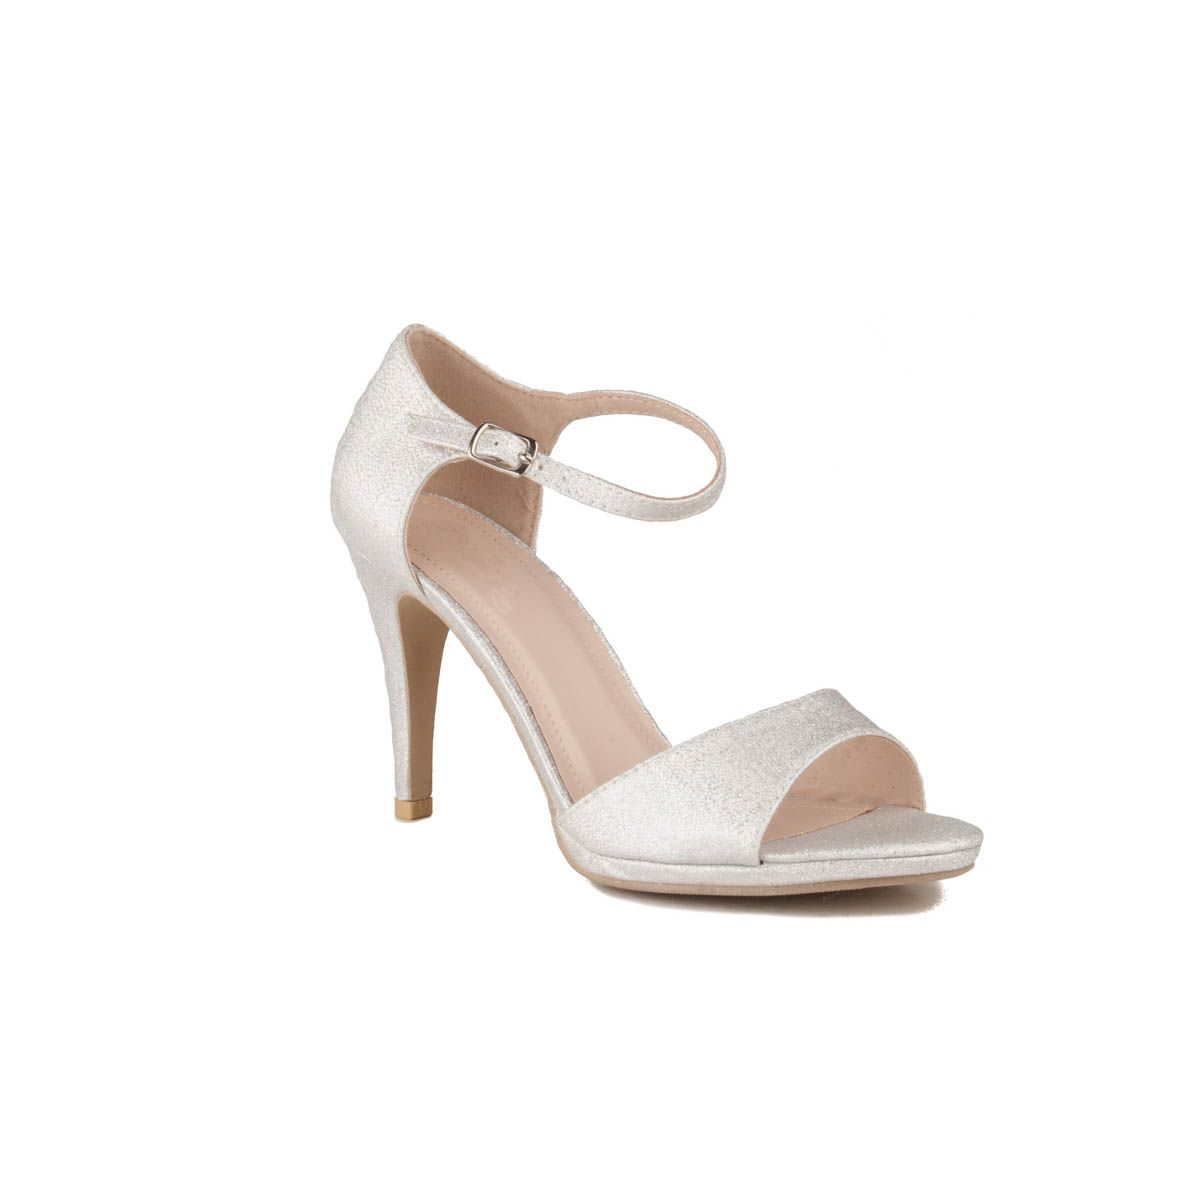 Montevita Heeled Sandal in Silver